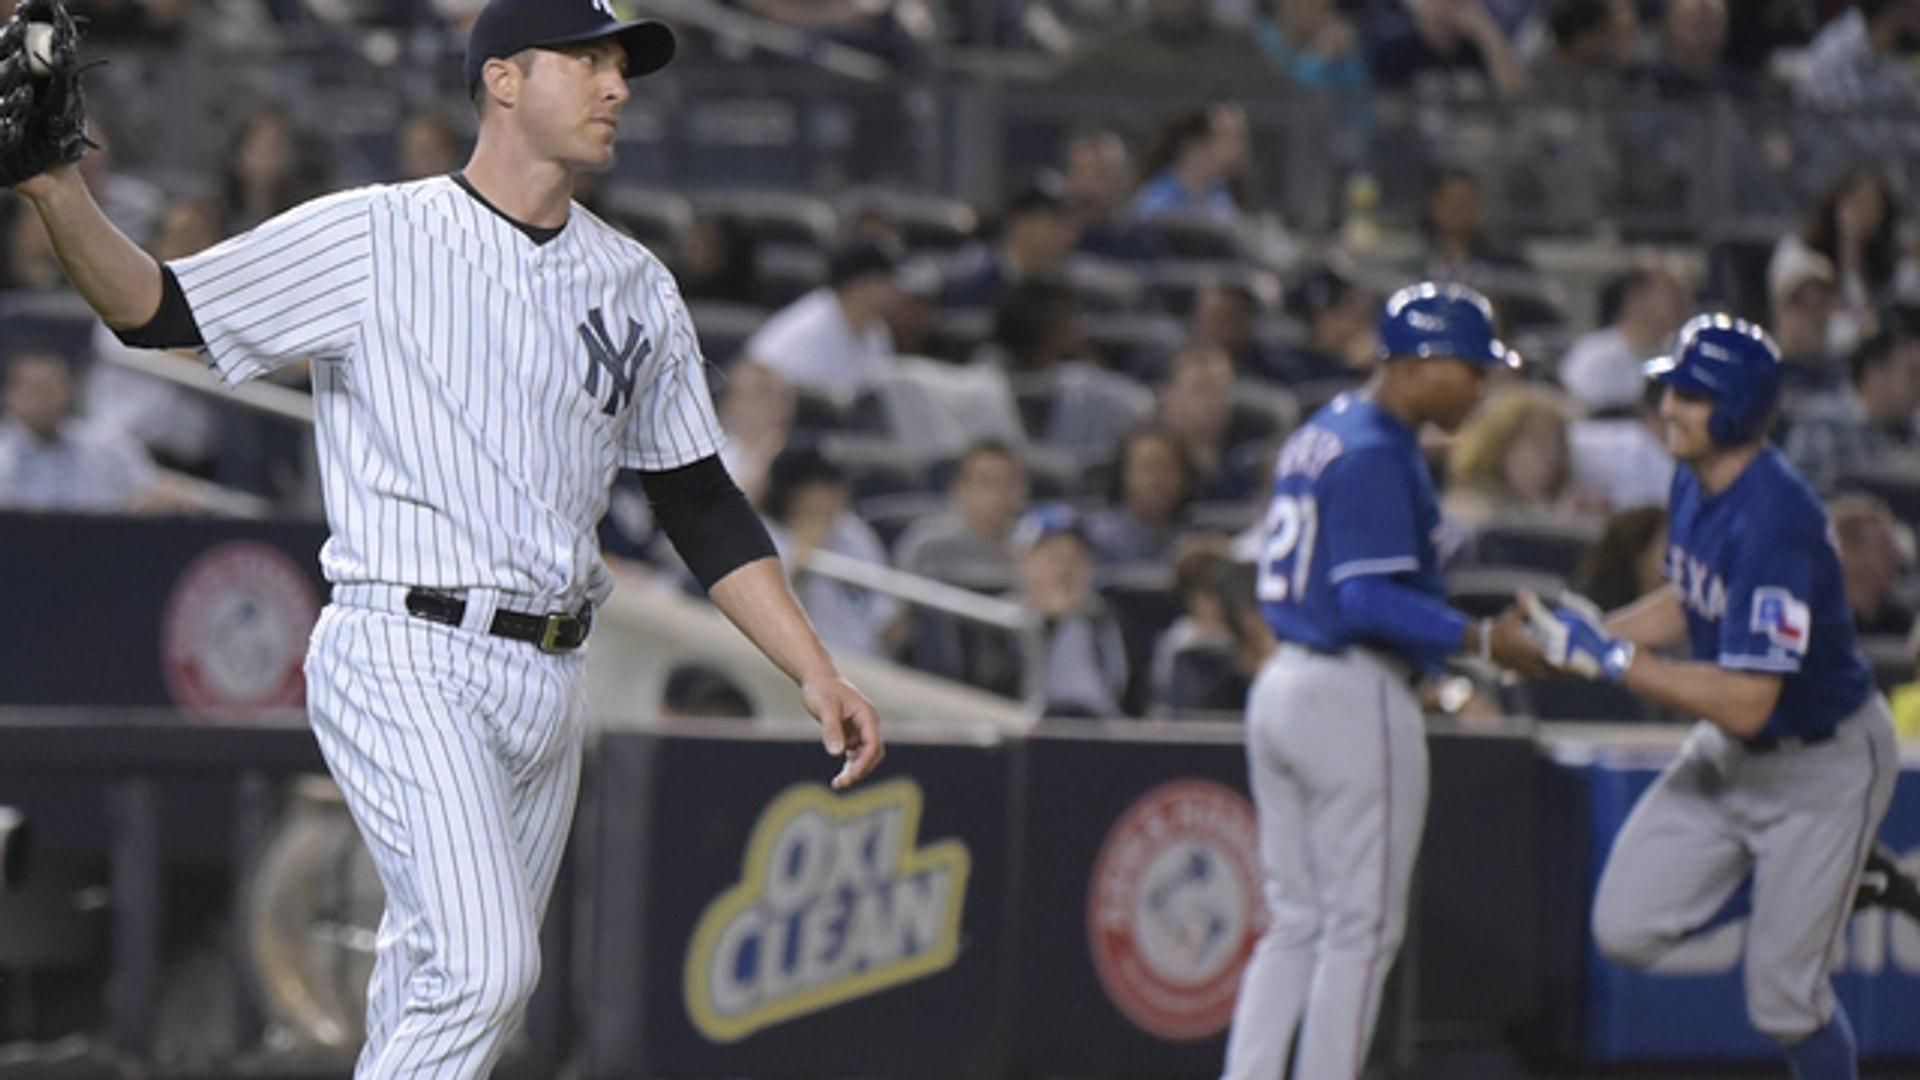 New York Teams Both Suffer Sweeps